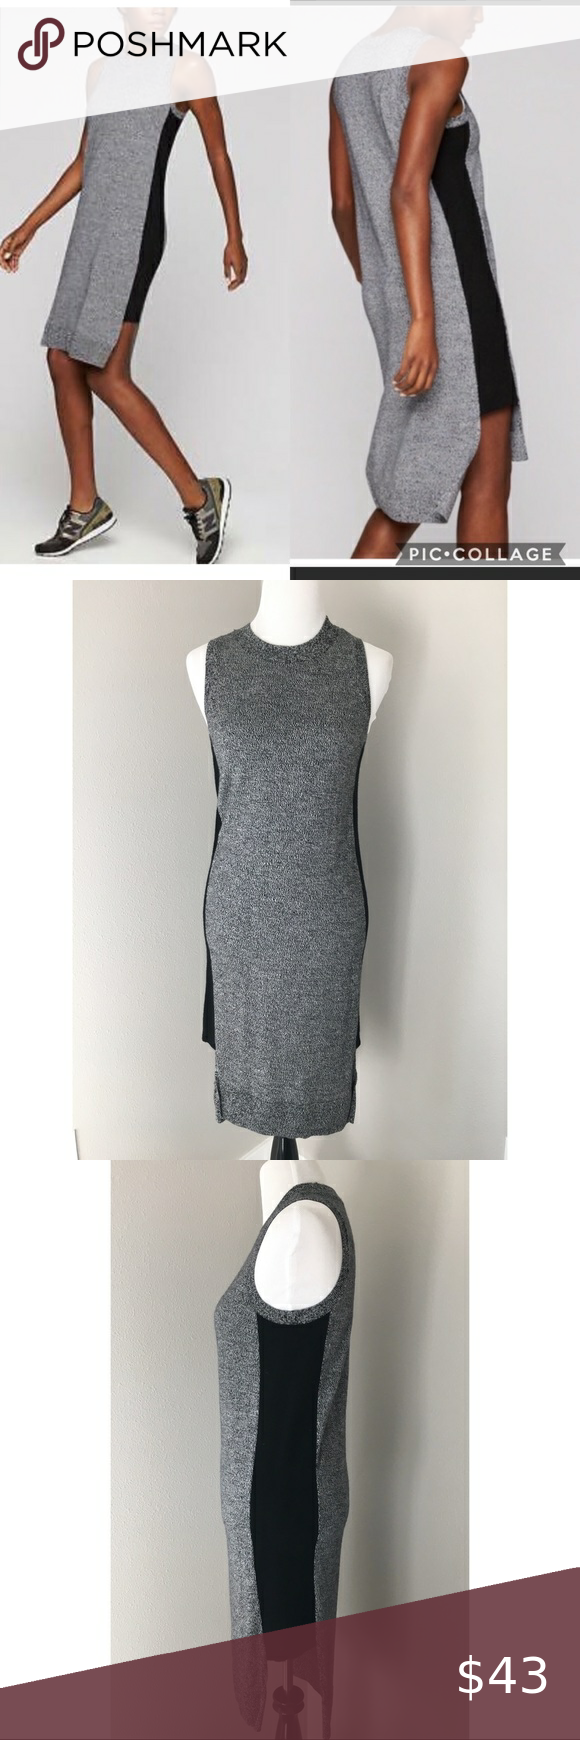 30+ Athleta merino wool dress ideas in 2021